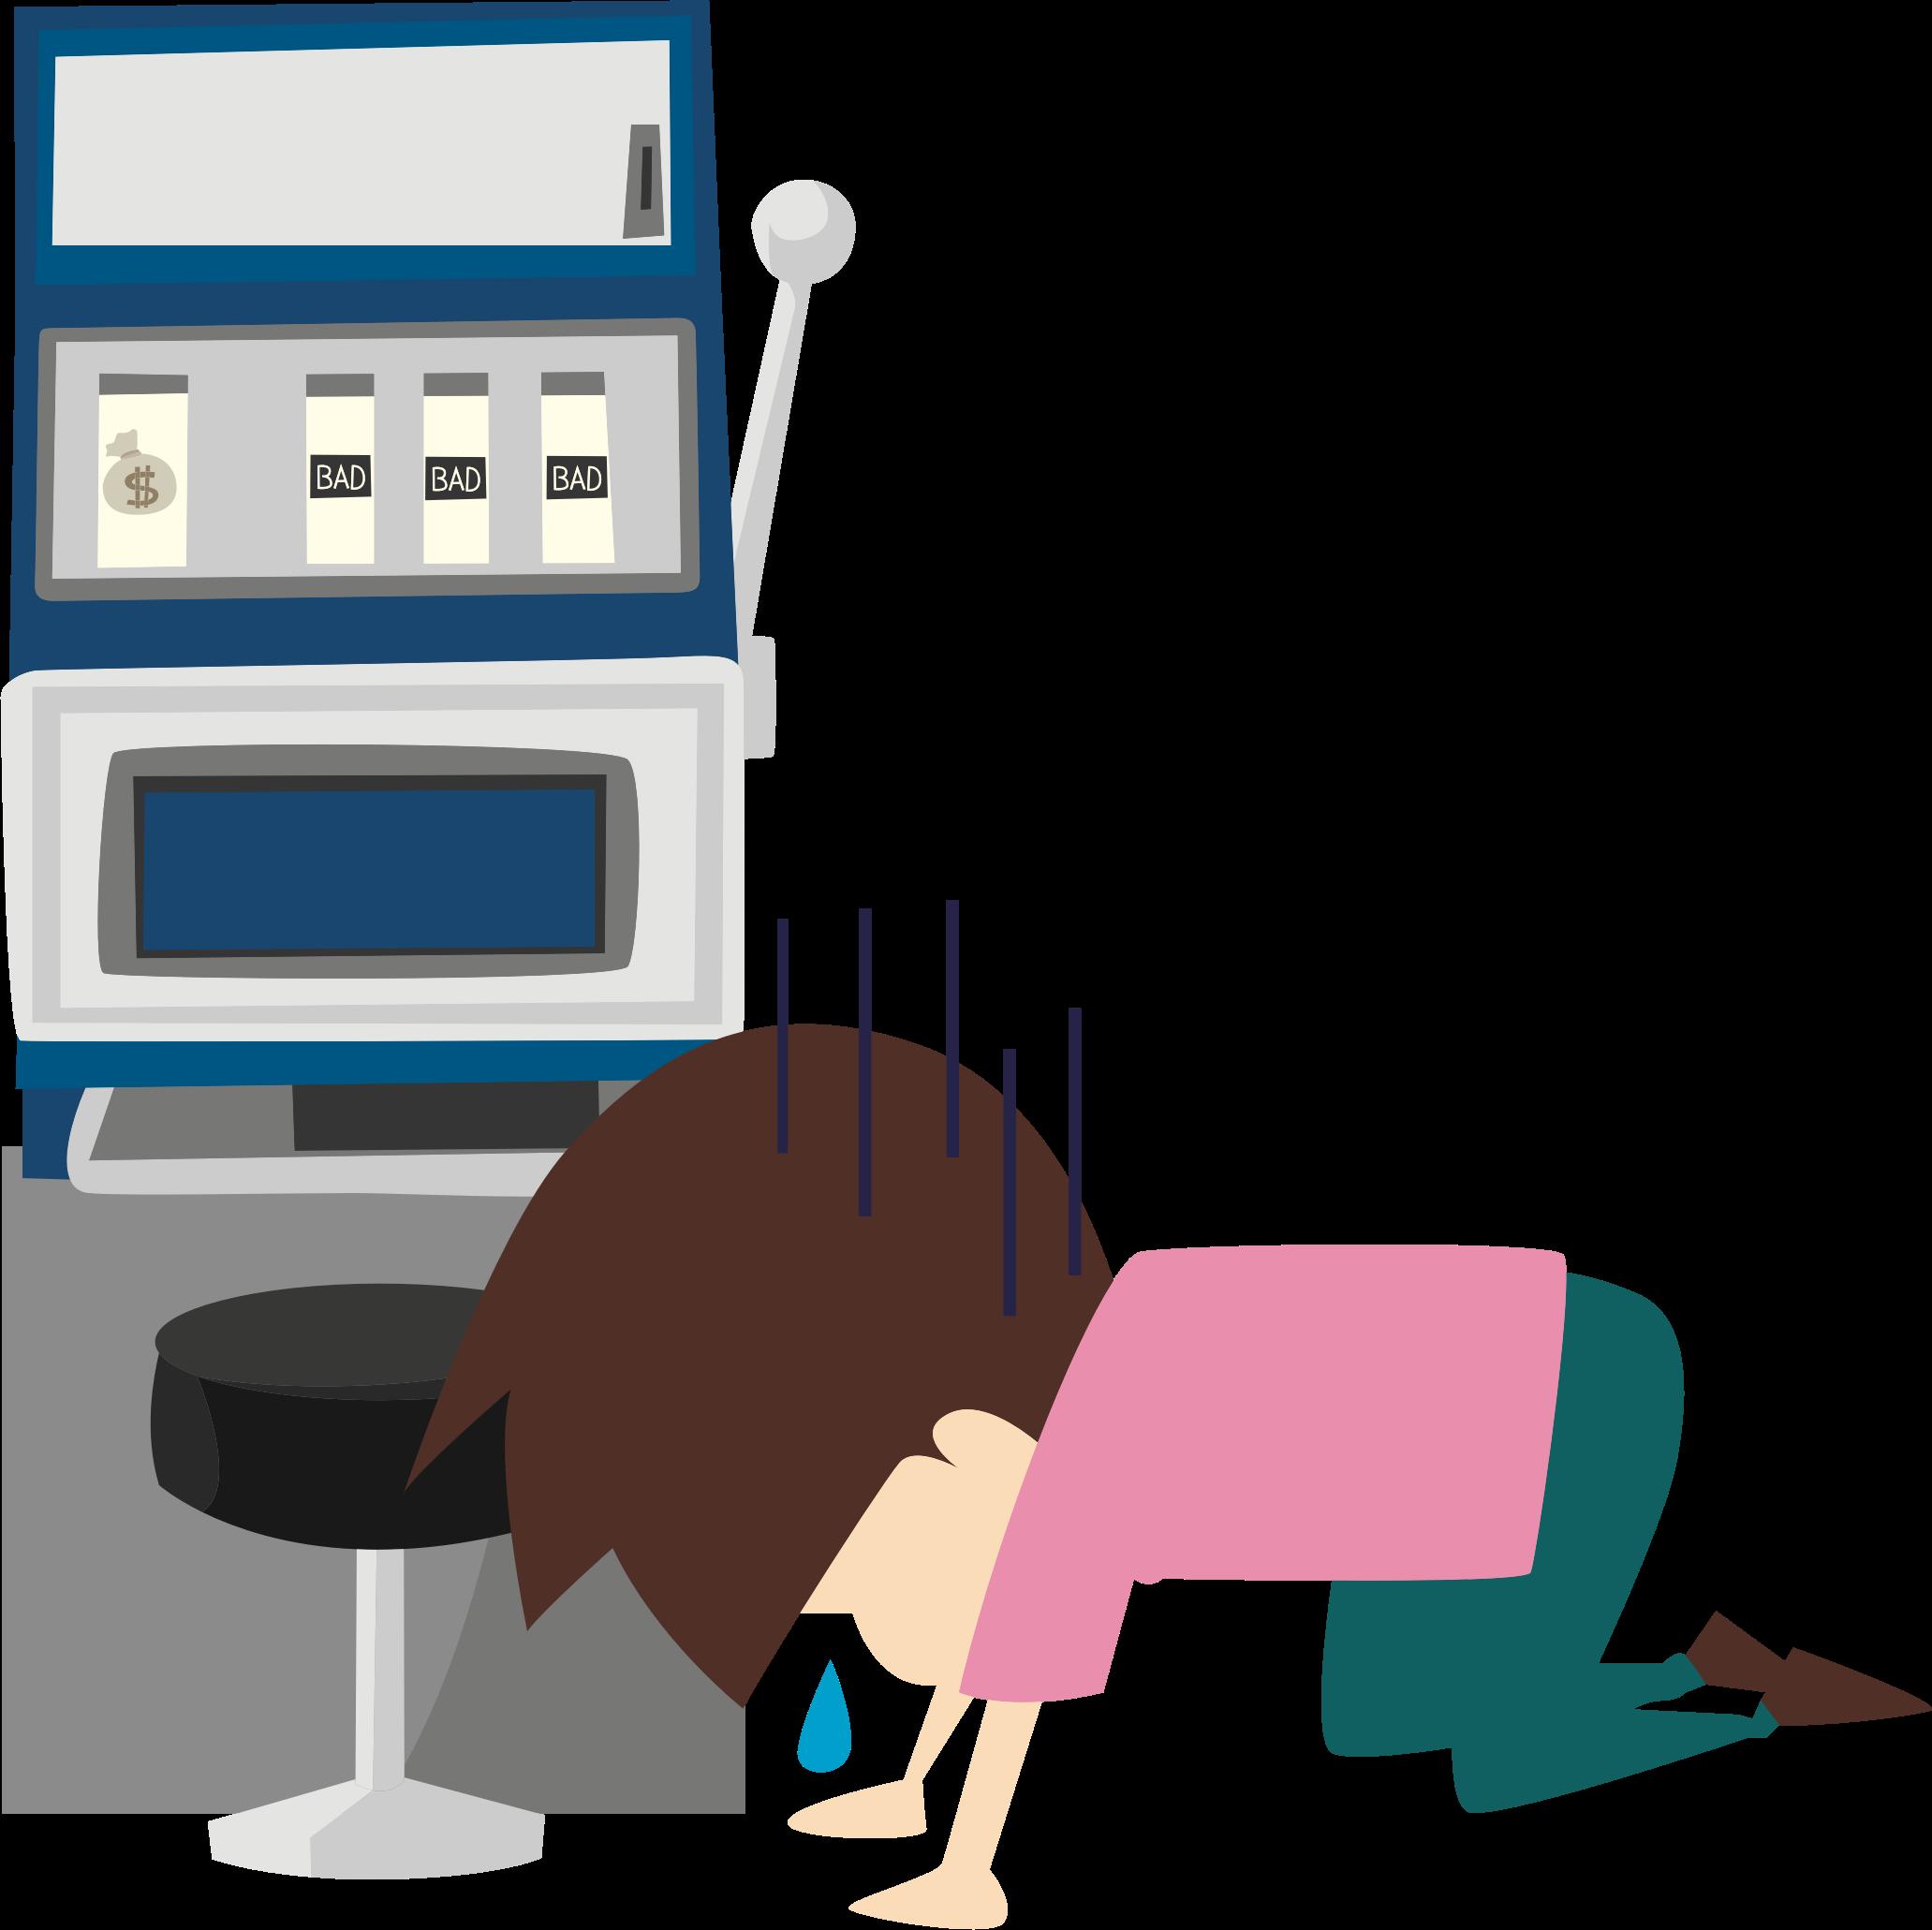 Slot Machine Loser by oksmith